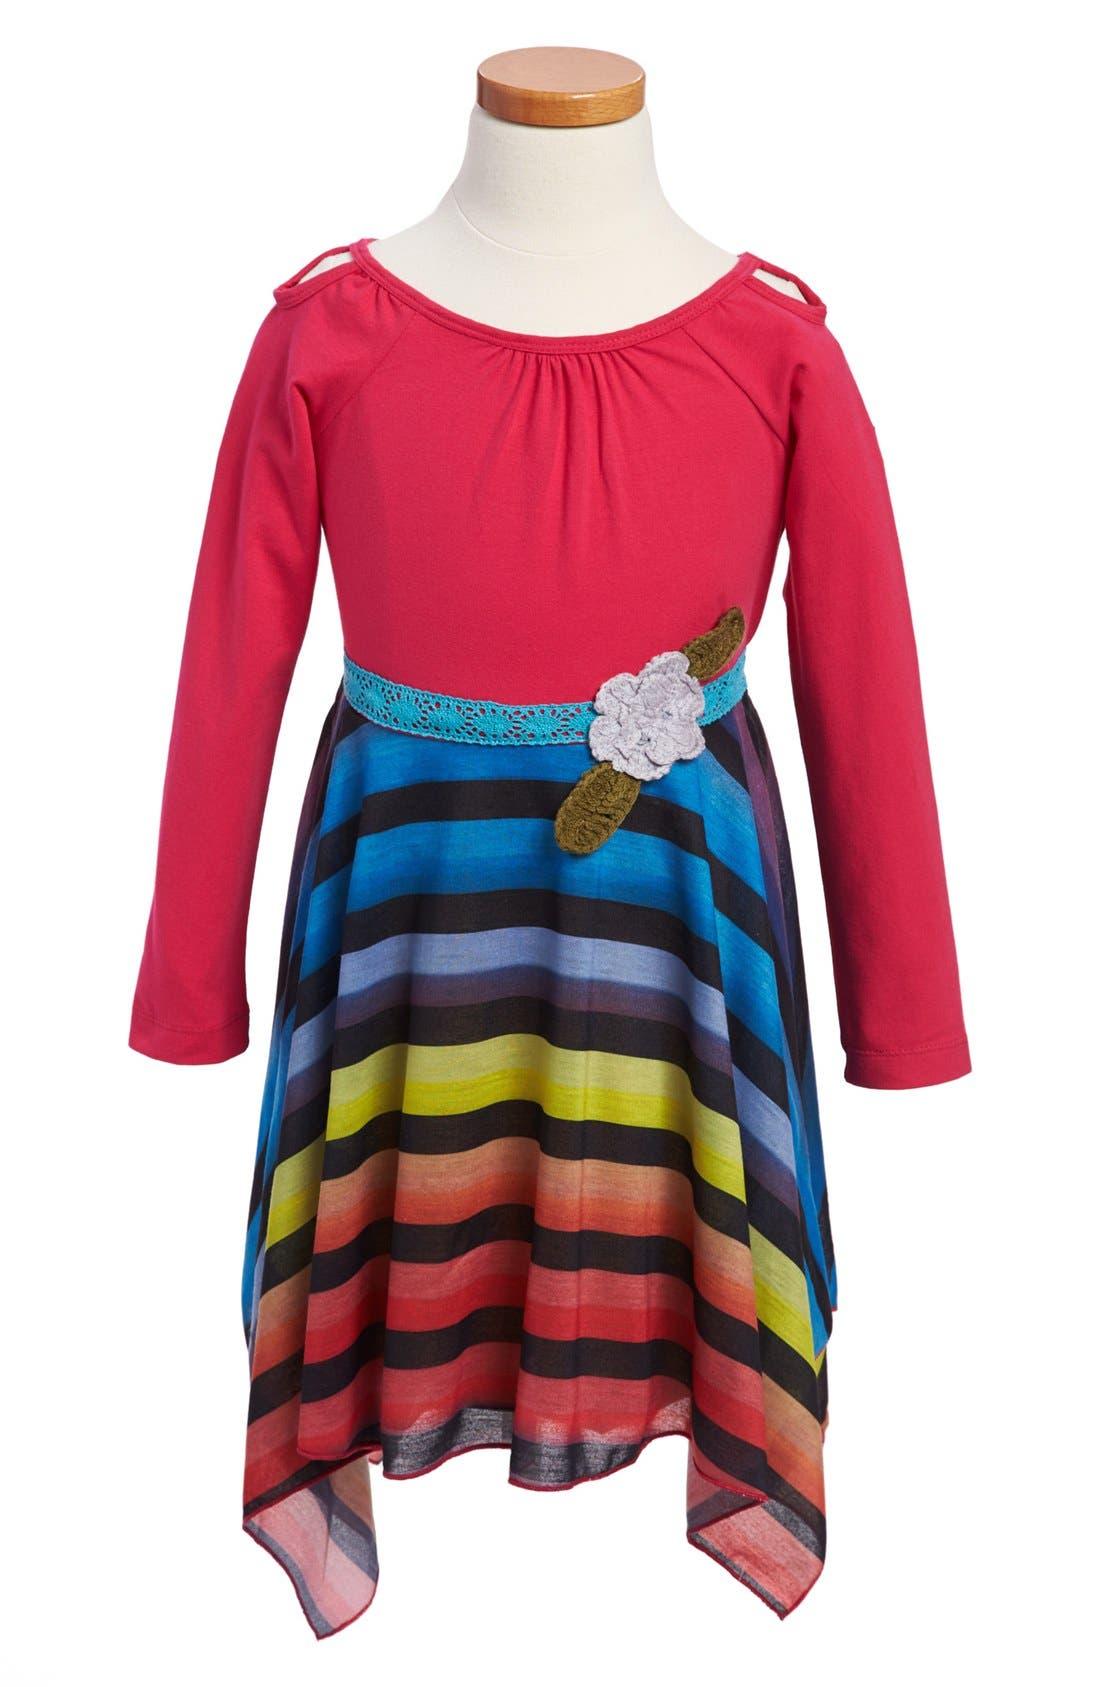 Alternate Image 1 Selected - Ella and Lulu Kidswear 'Shark Bite' Stripe Dress (Little Girls & Big Girls)